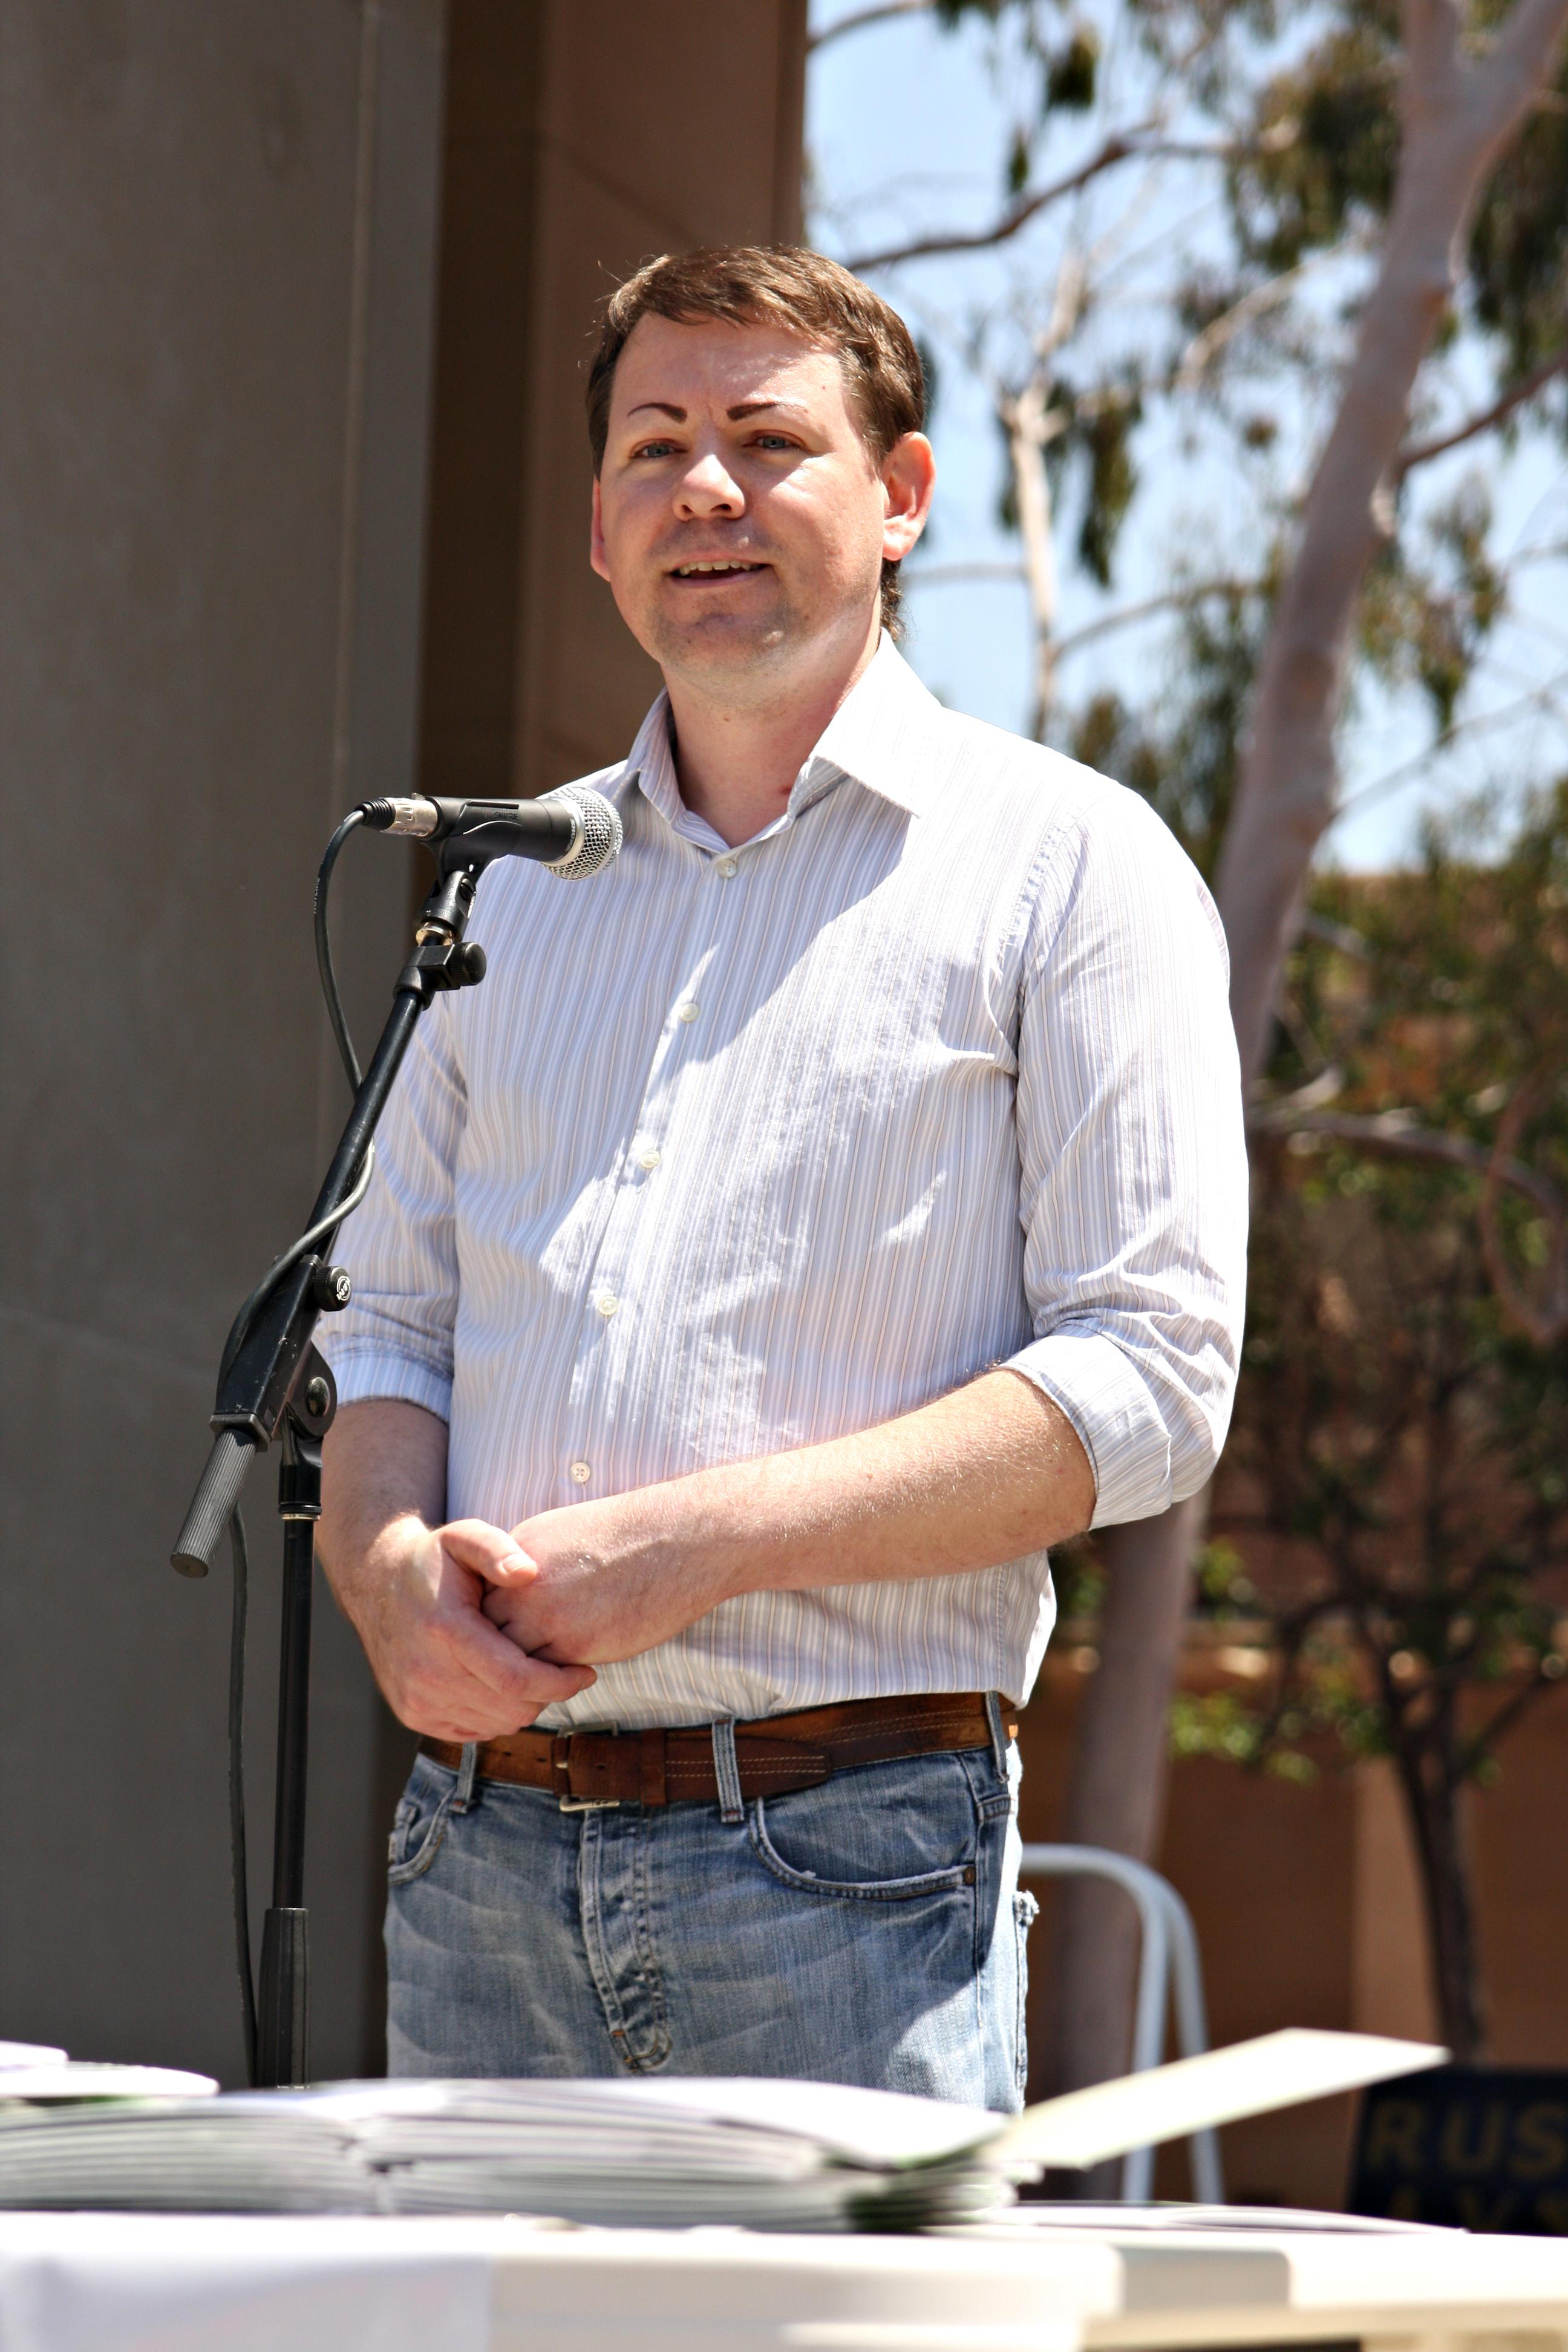 David Jentsch